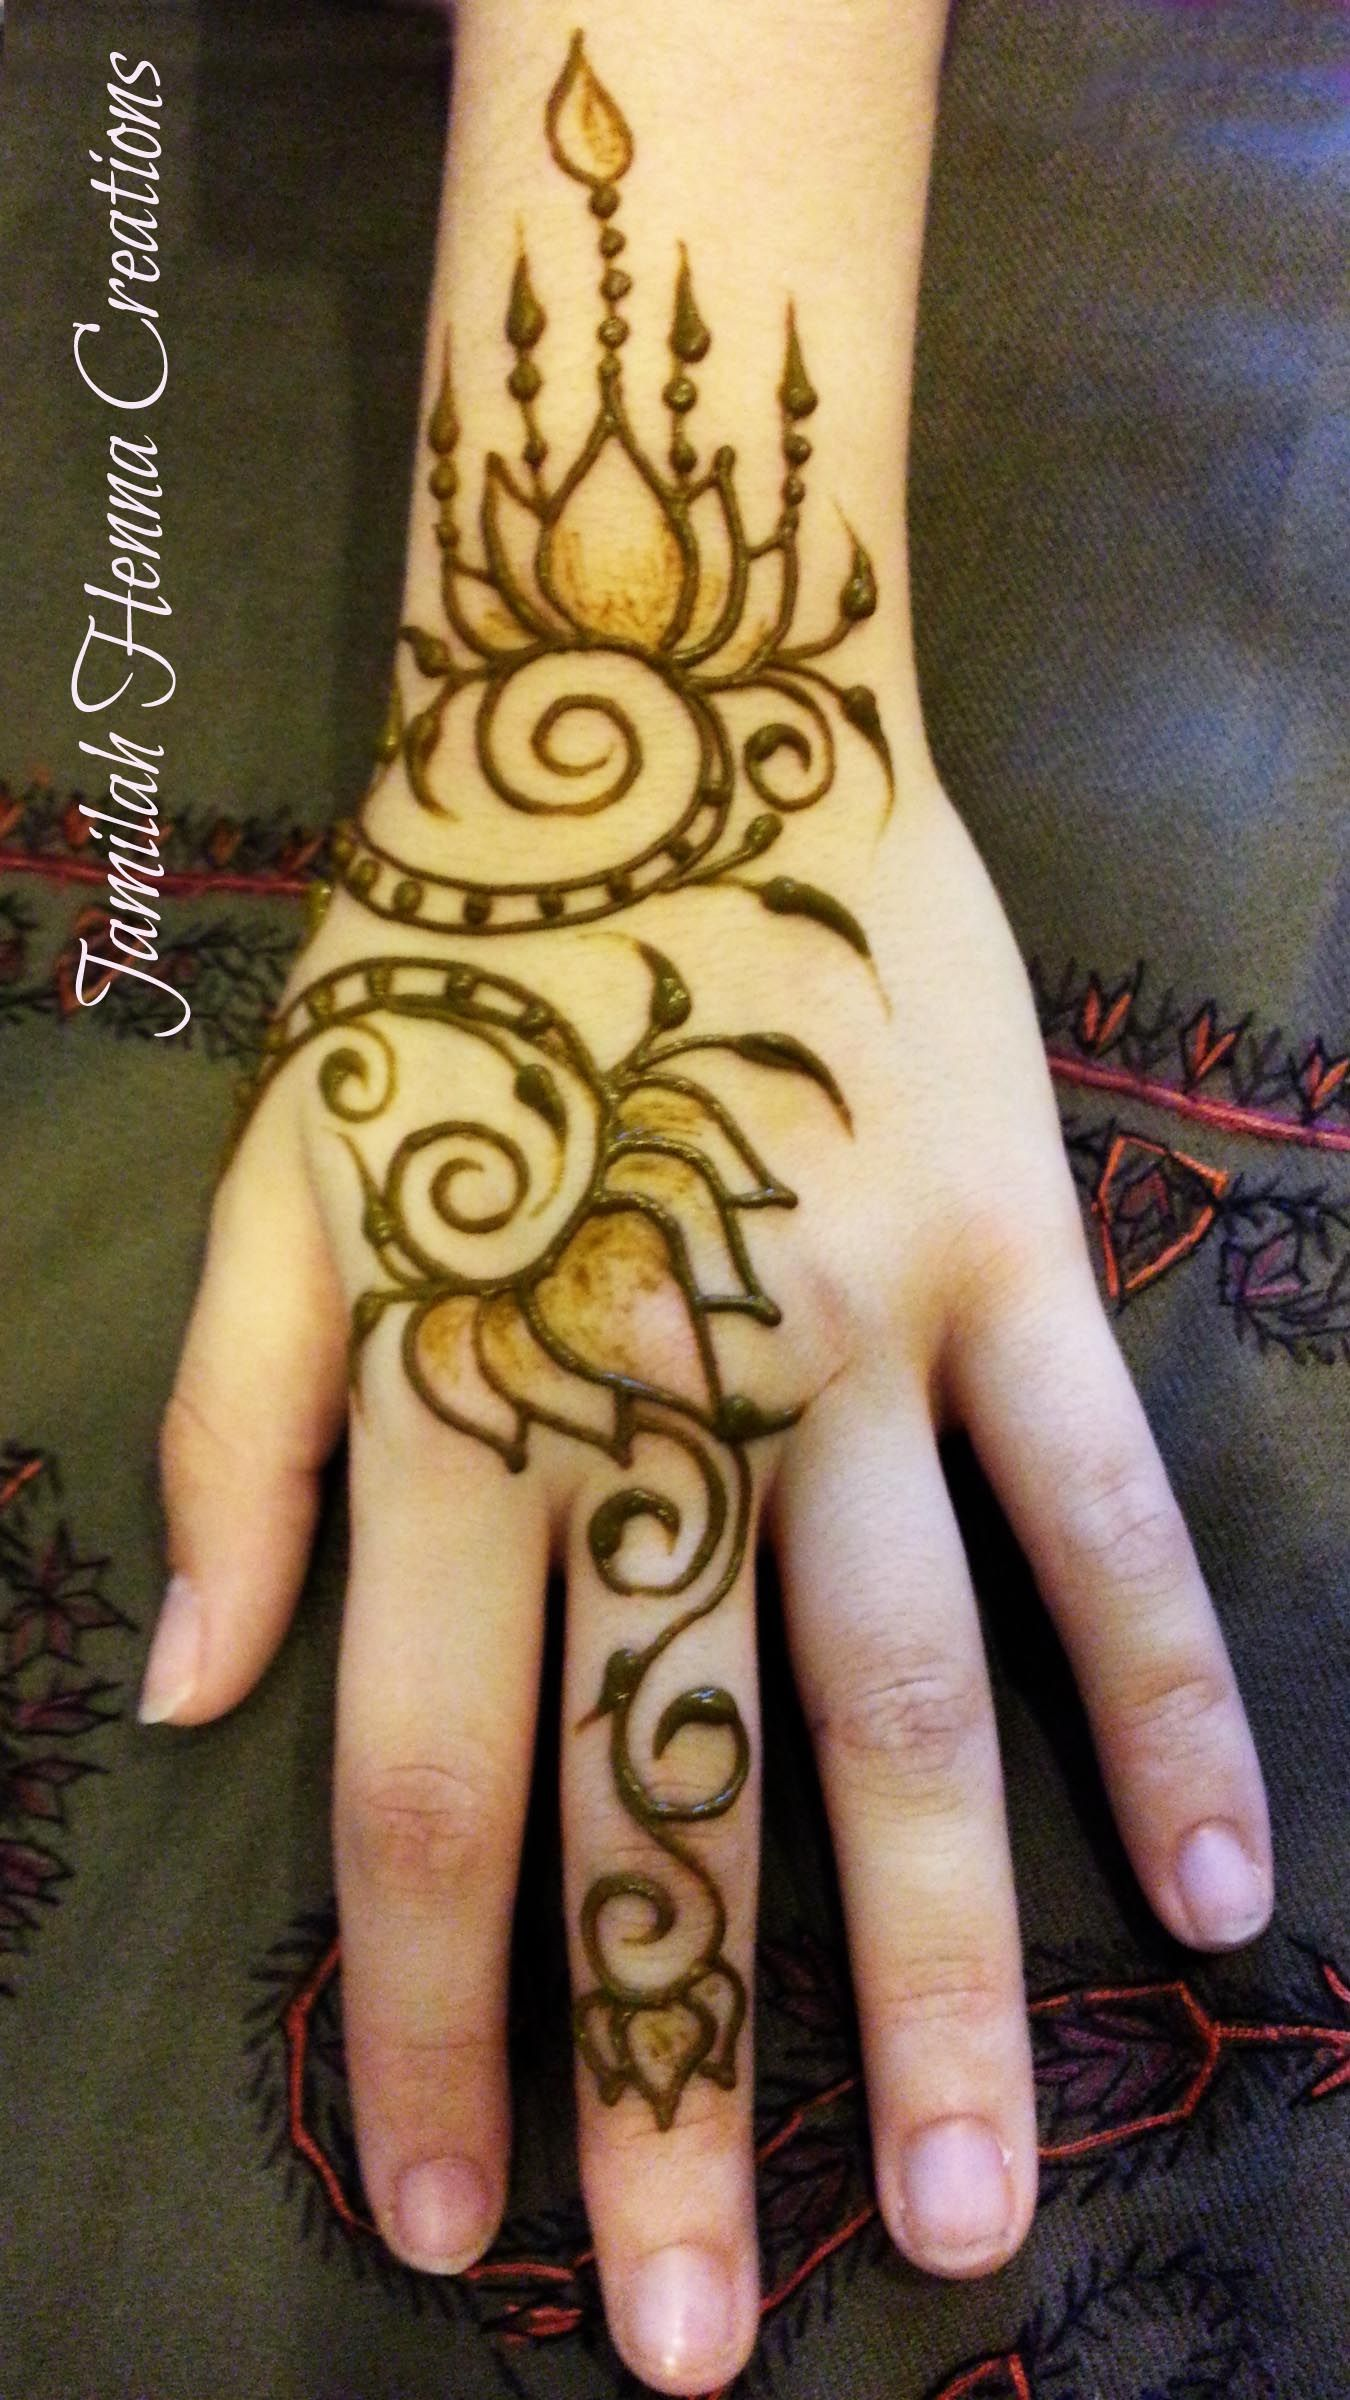 Lotus Flower Henna Tattoo Designs: Lotus Flower Henna Www.jamilahHennaCreations.com